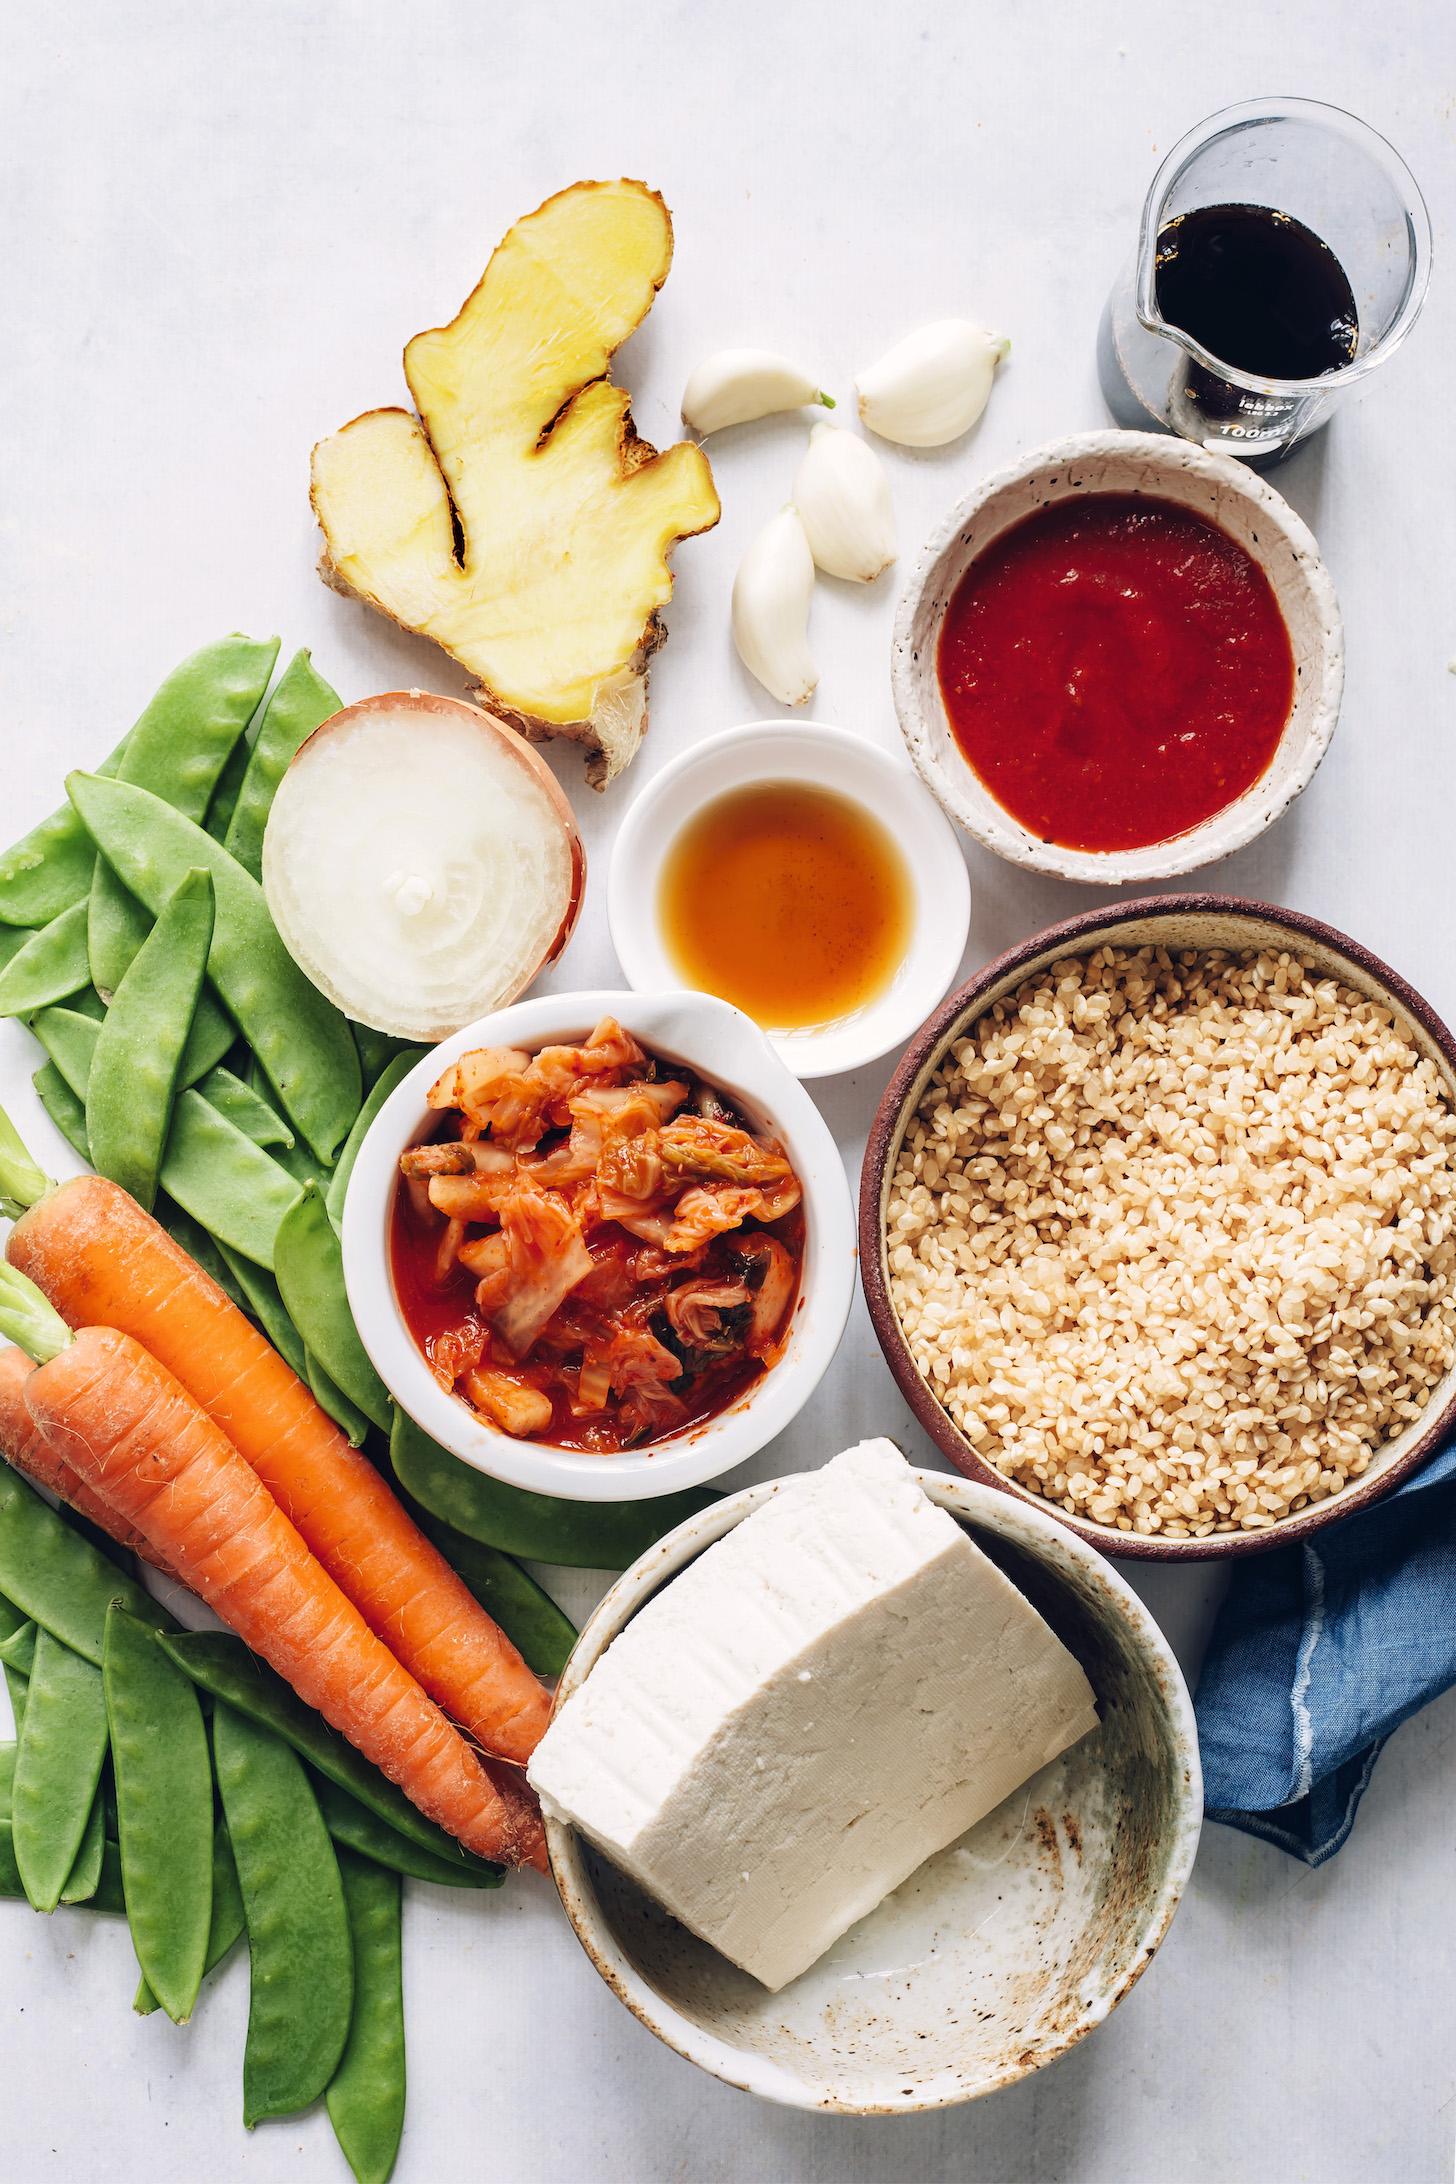 Zanahorias, guisantes, tofu, kimchi, arroz, cebolla, ajo, jengibre, aceite de sésamo tostado, gochujang y tamari